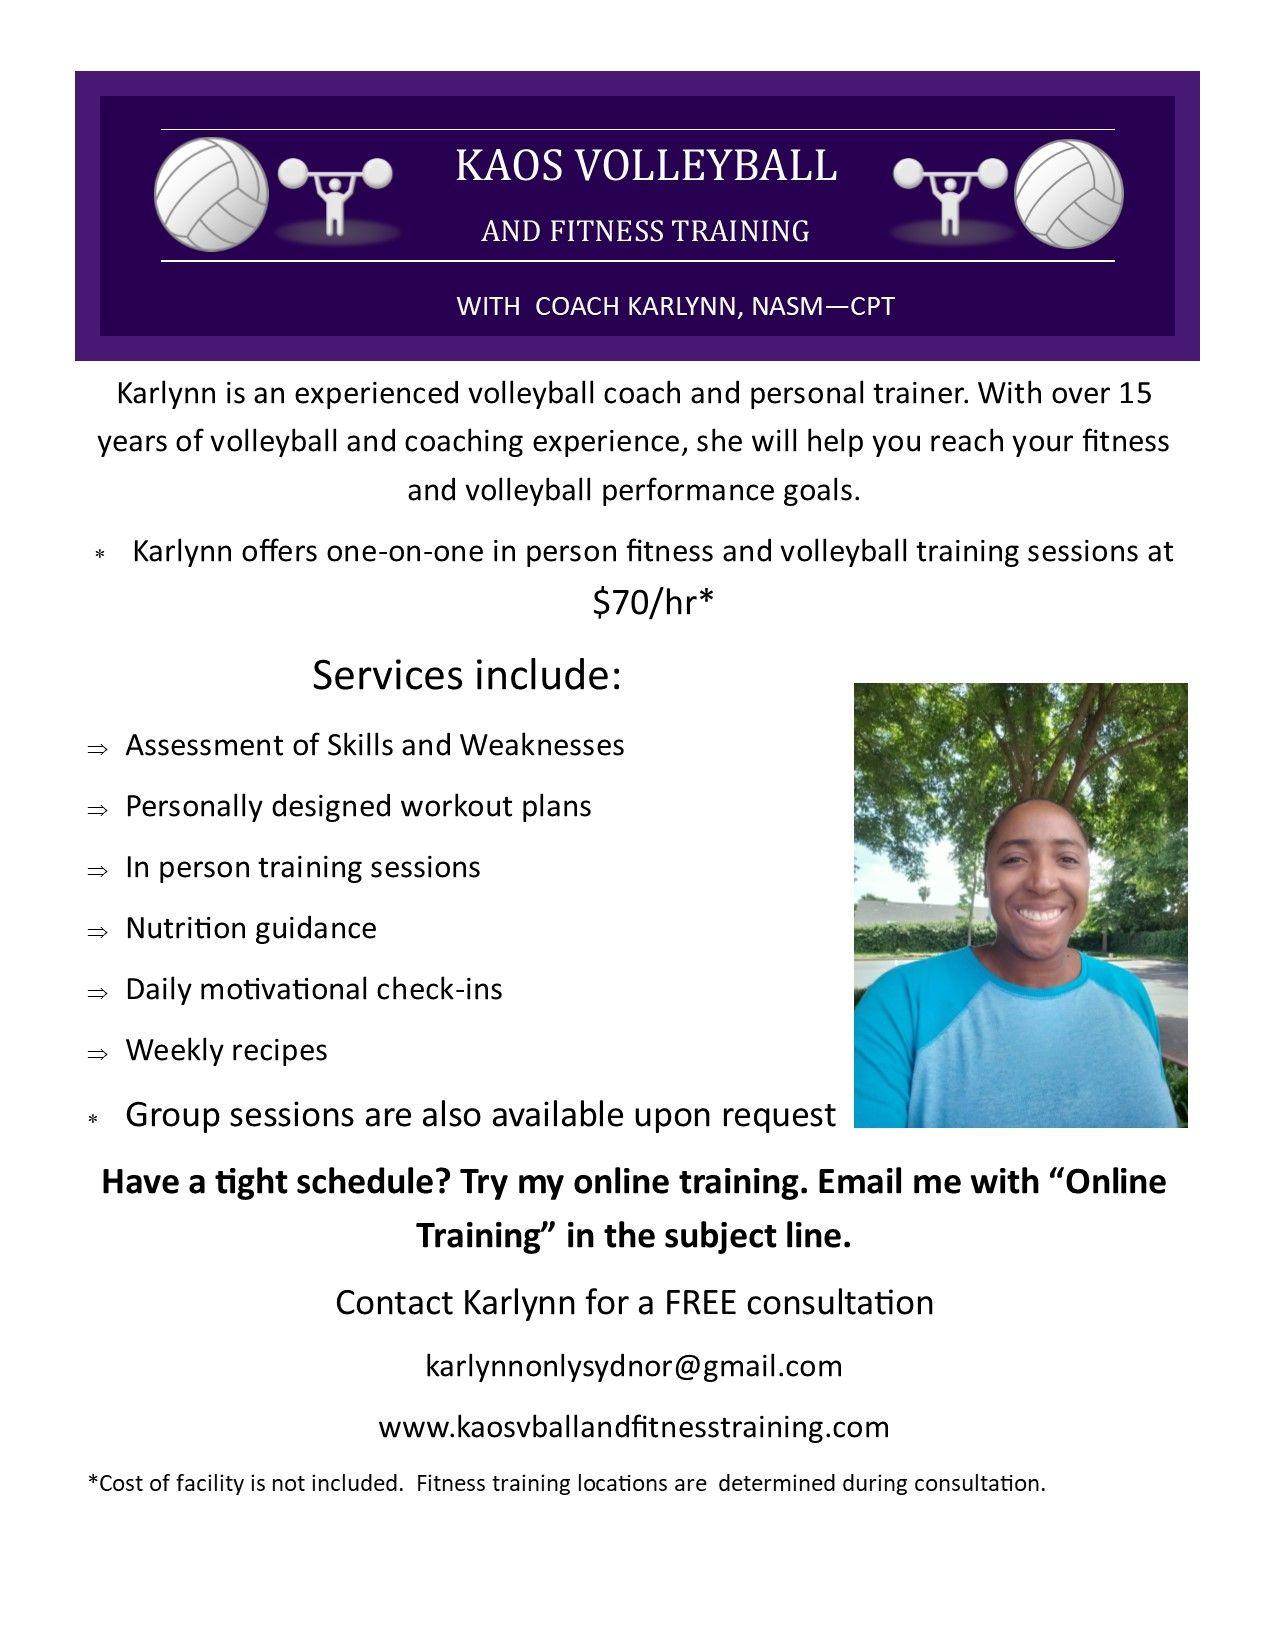 PreHoliday Fitness Training Fitness training, Holiday